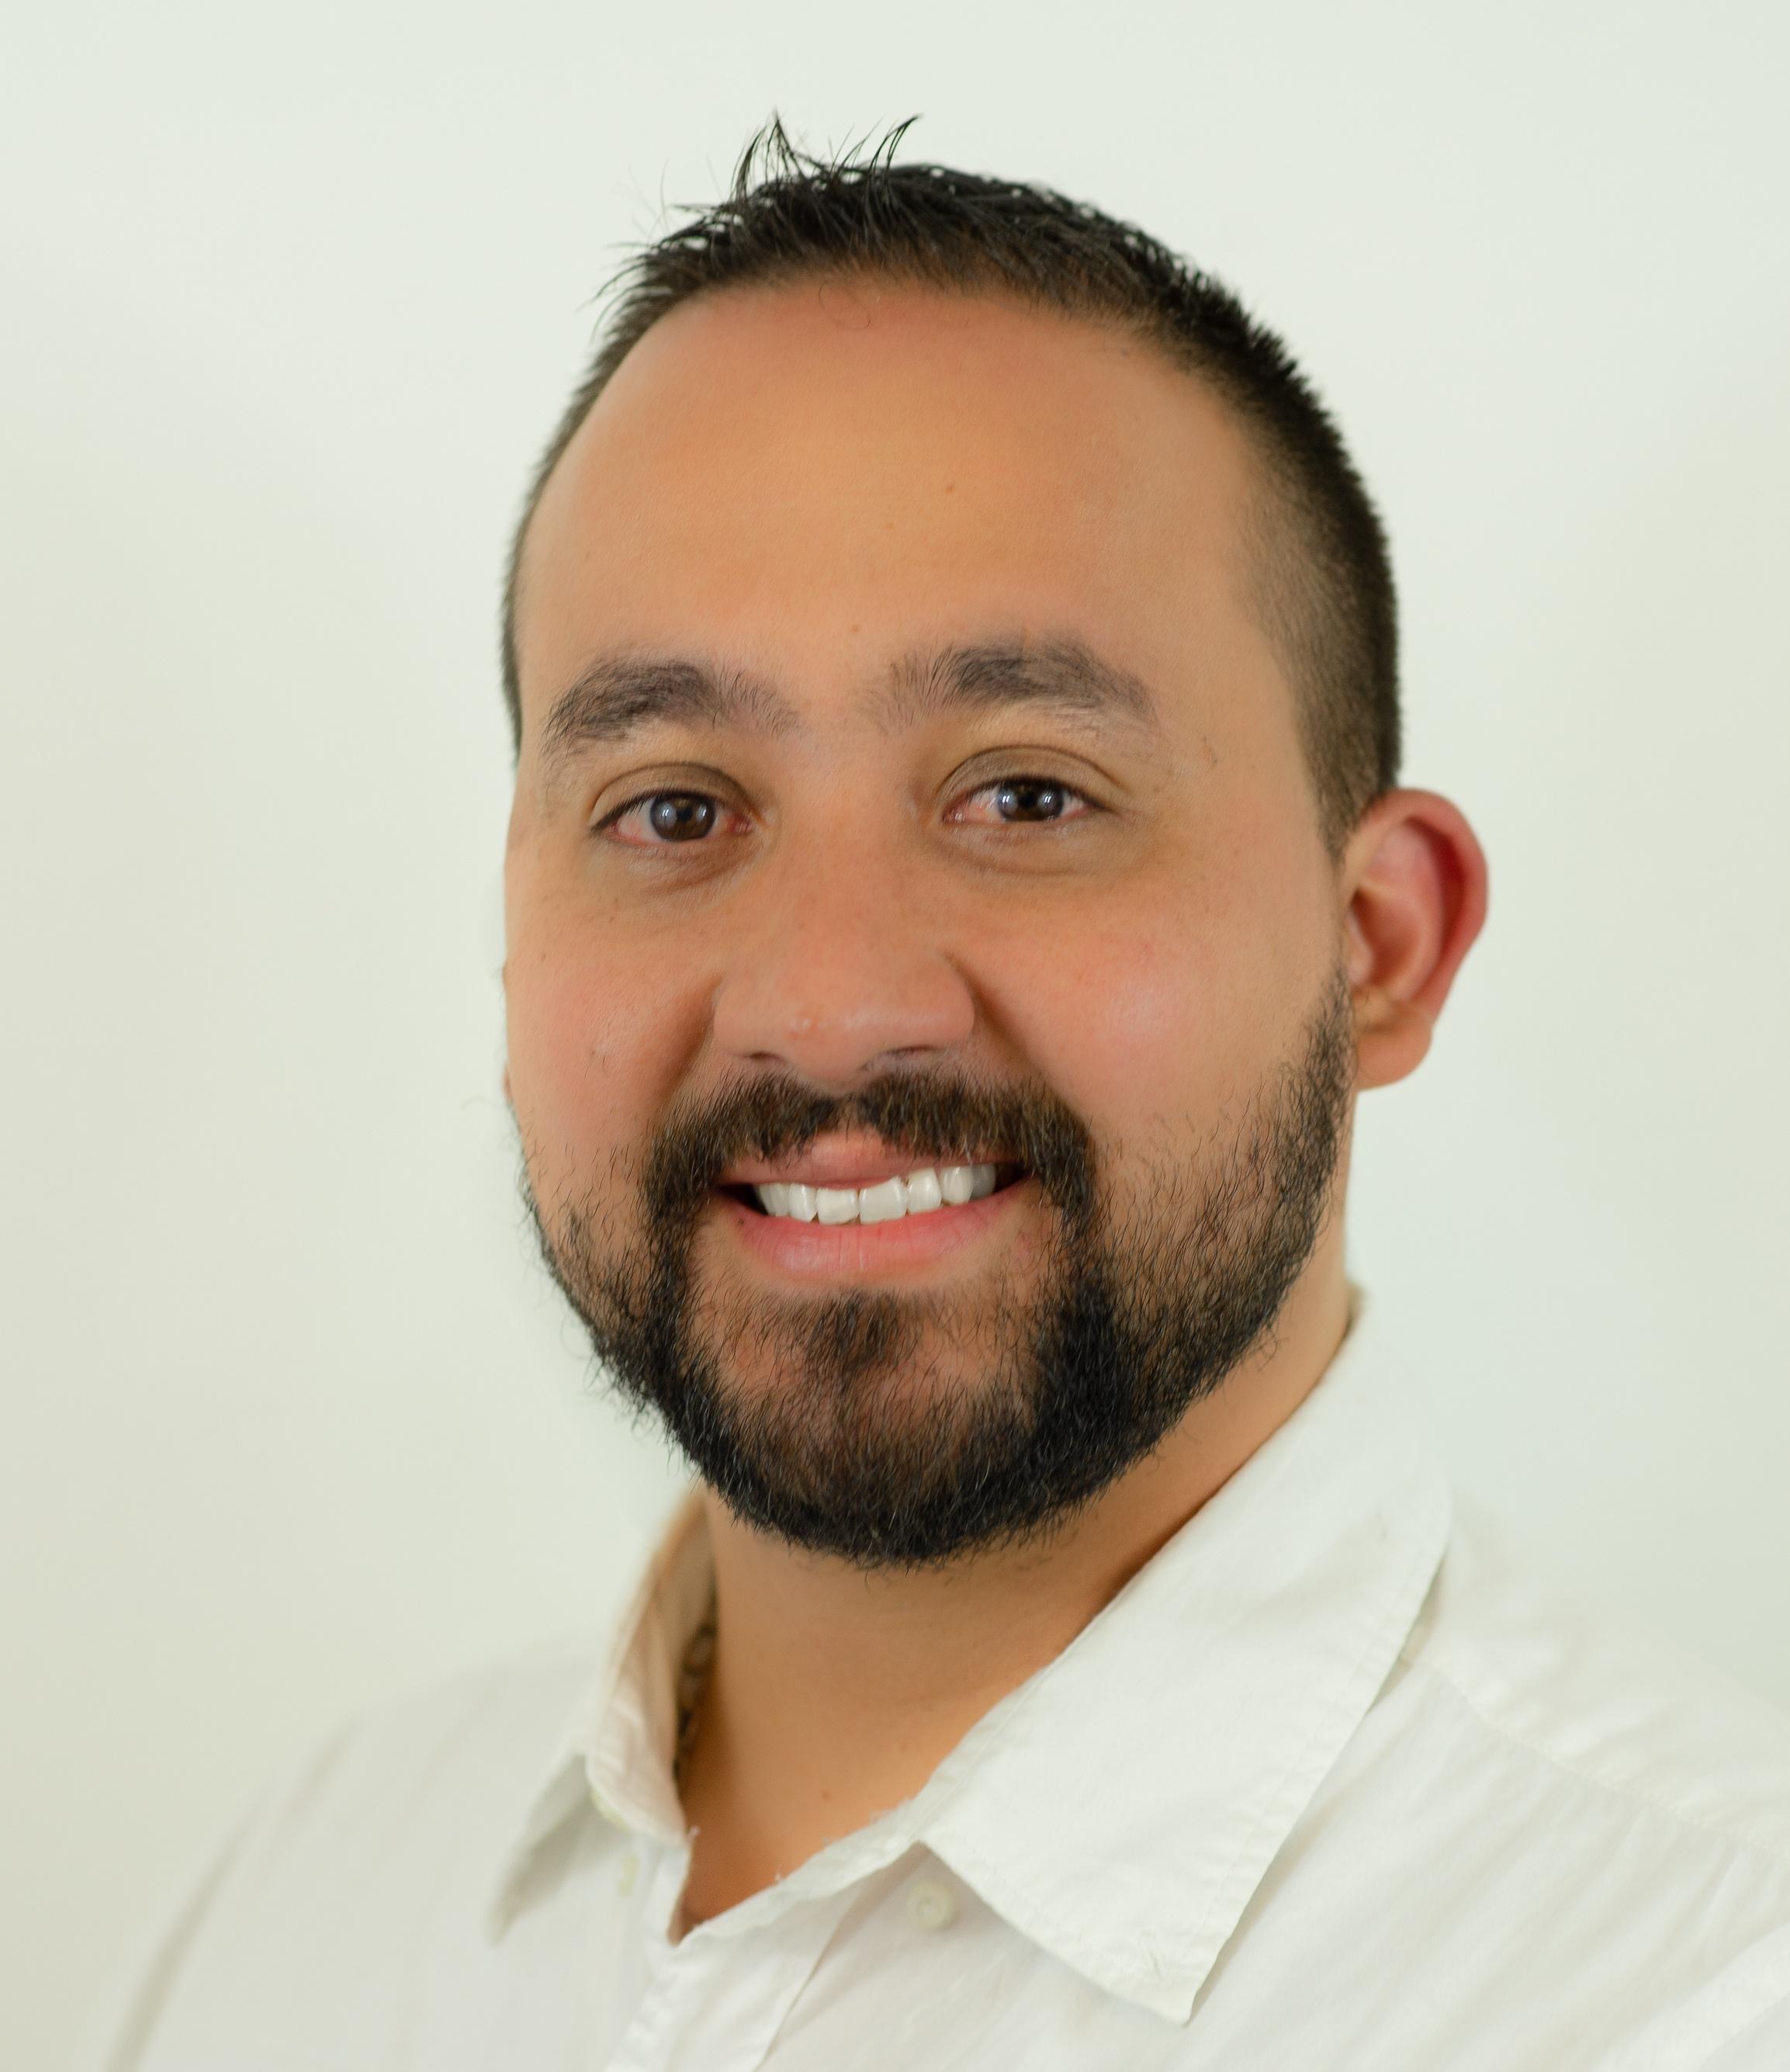 Jorge Salazaar